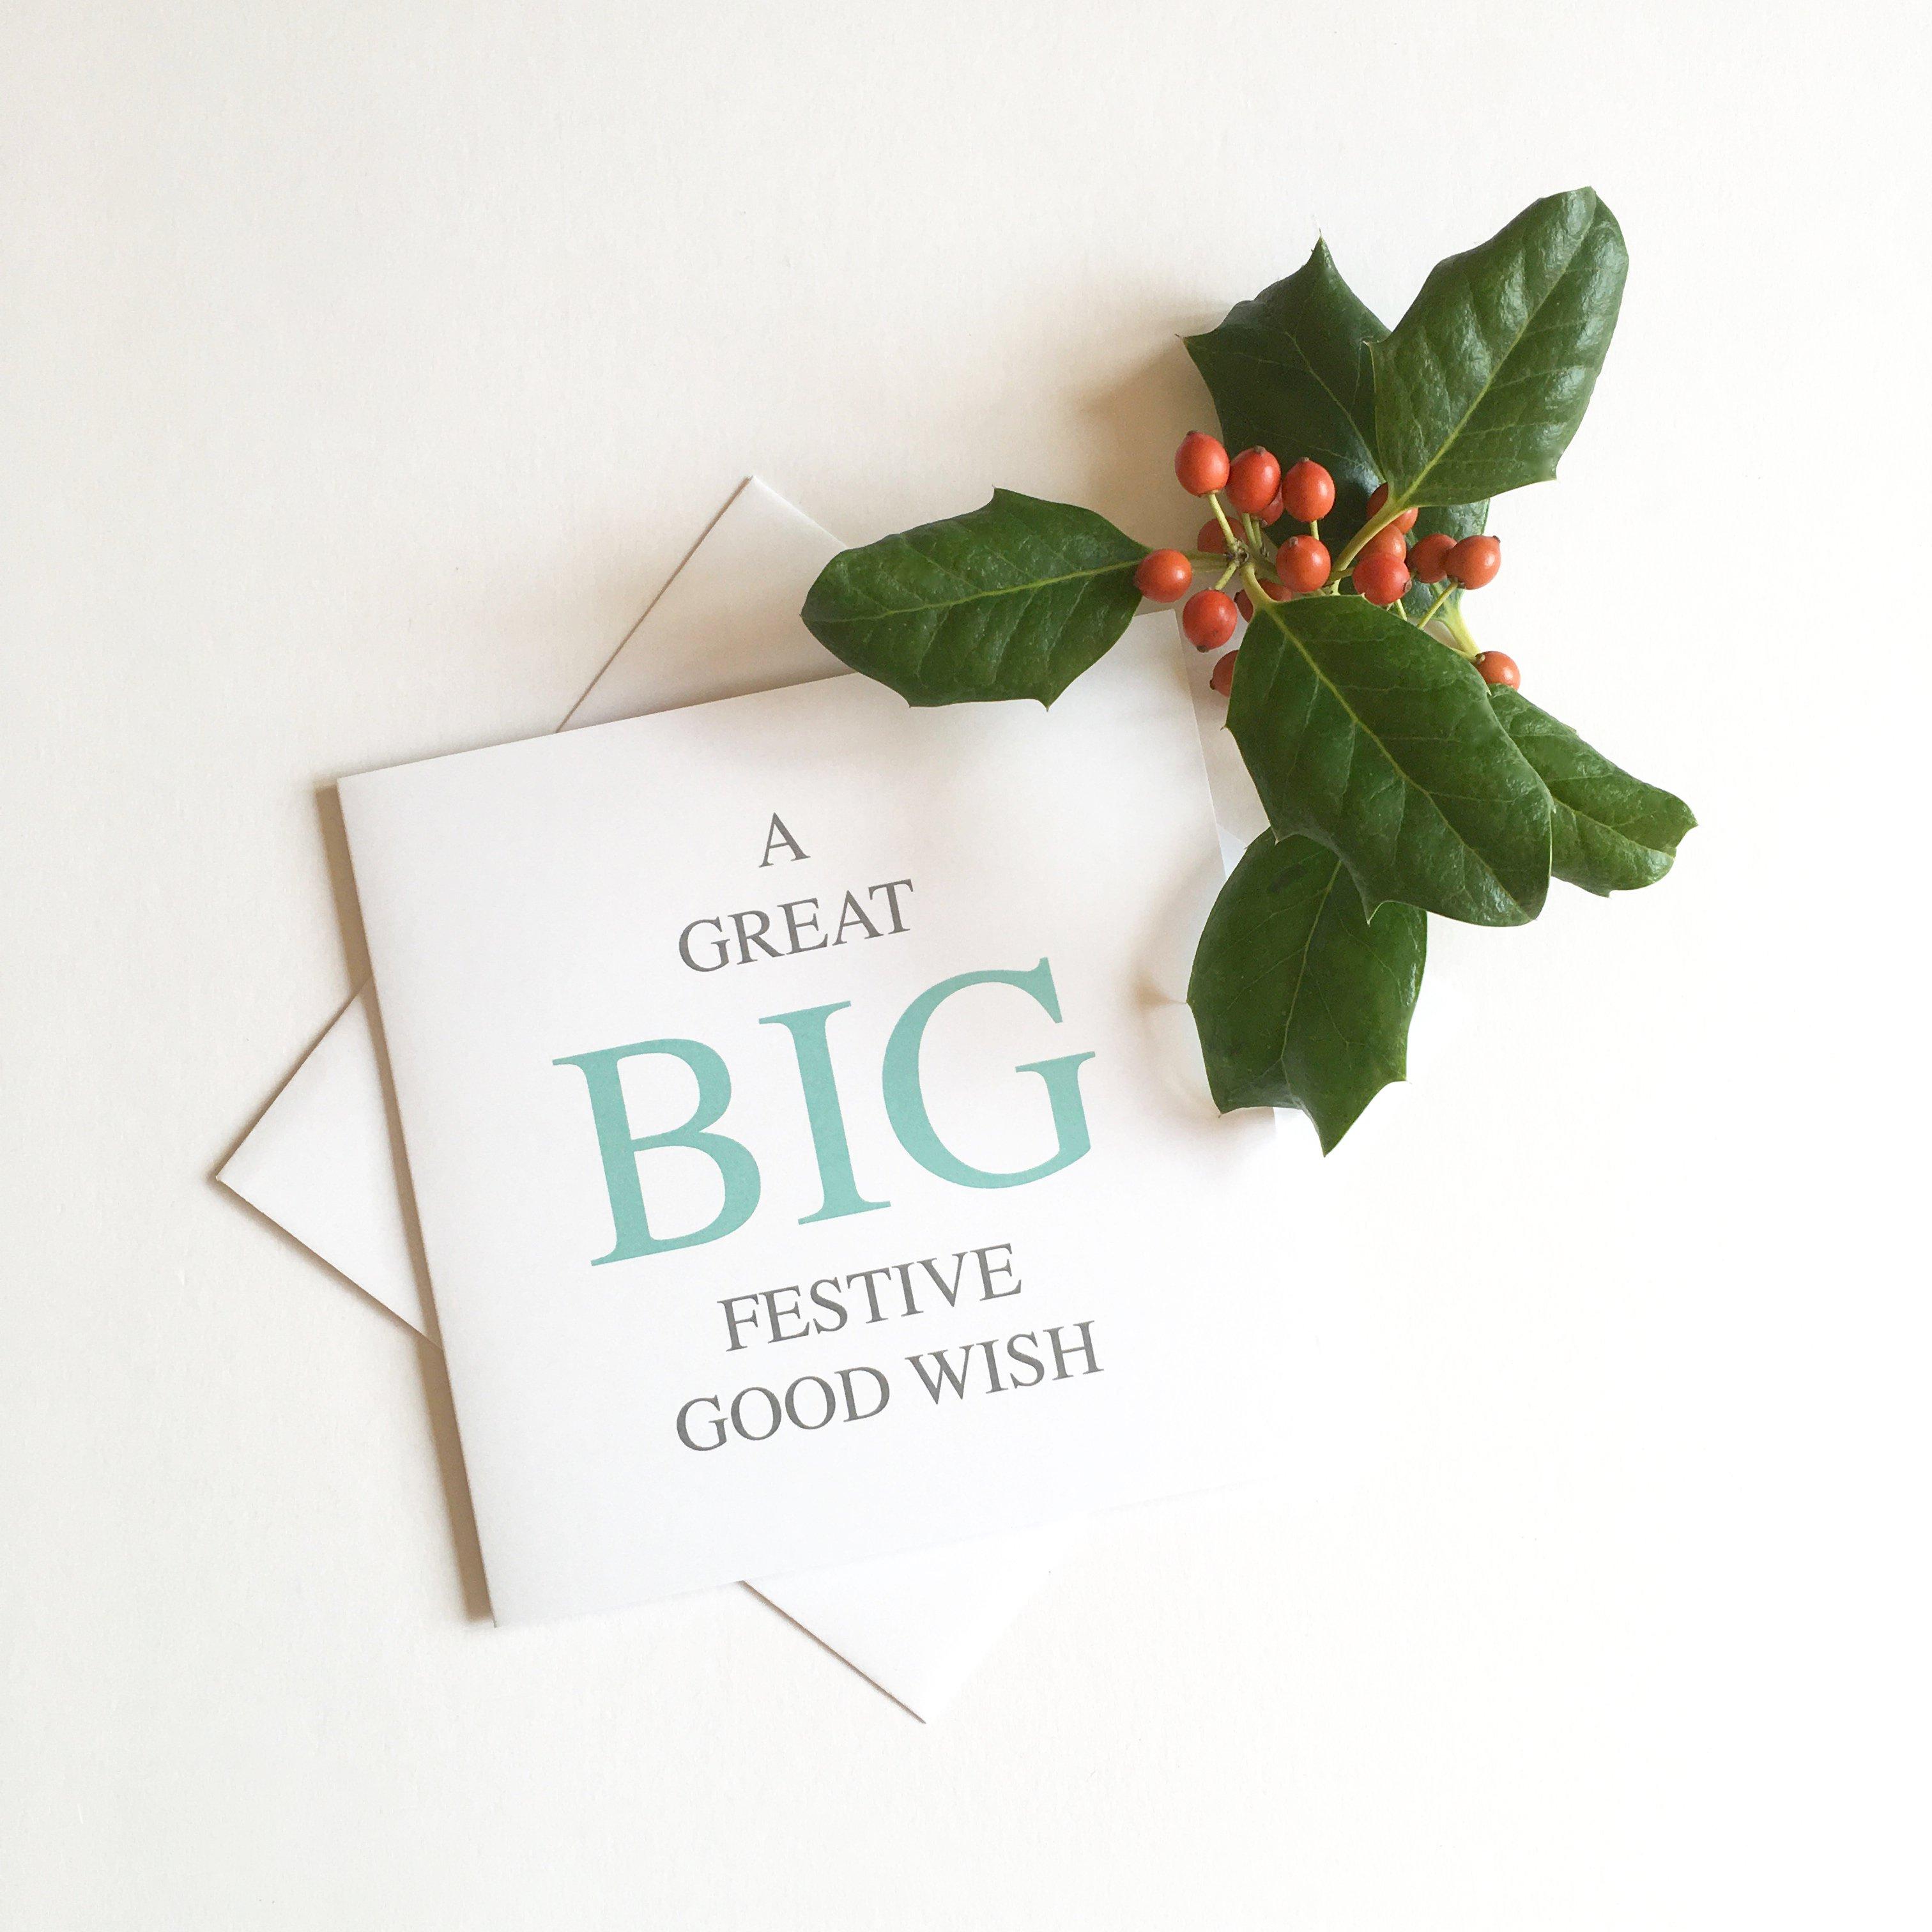 festive good wish big message greeting card